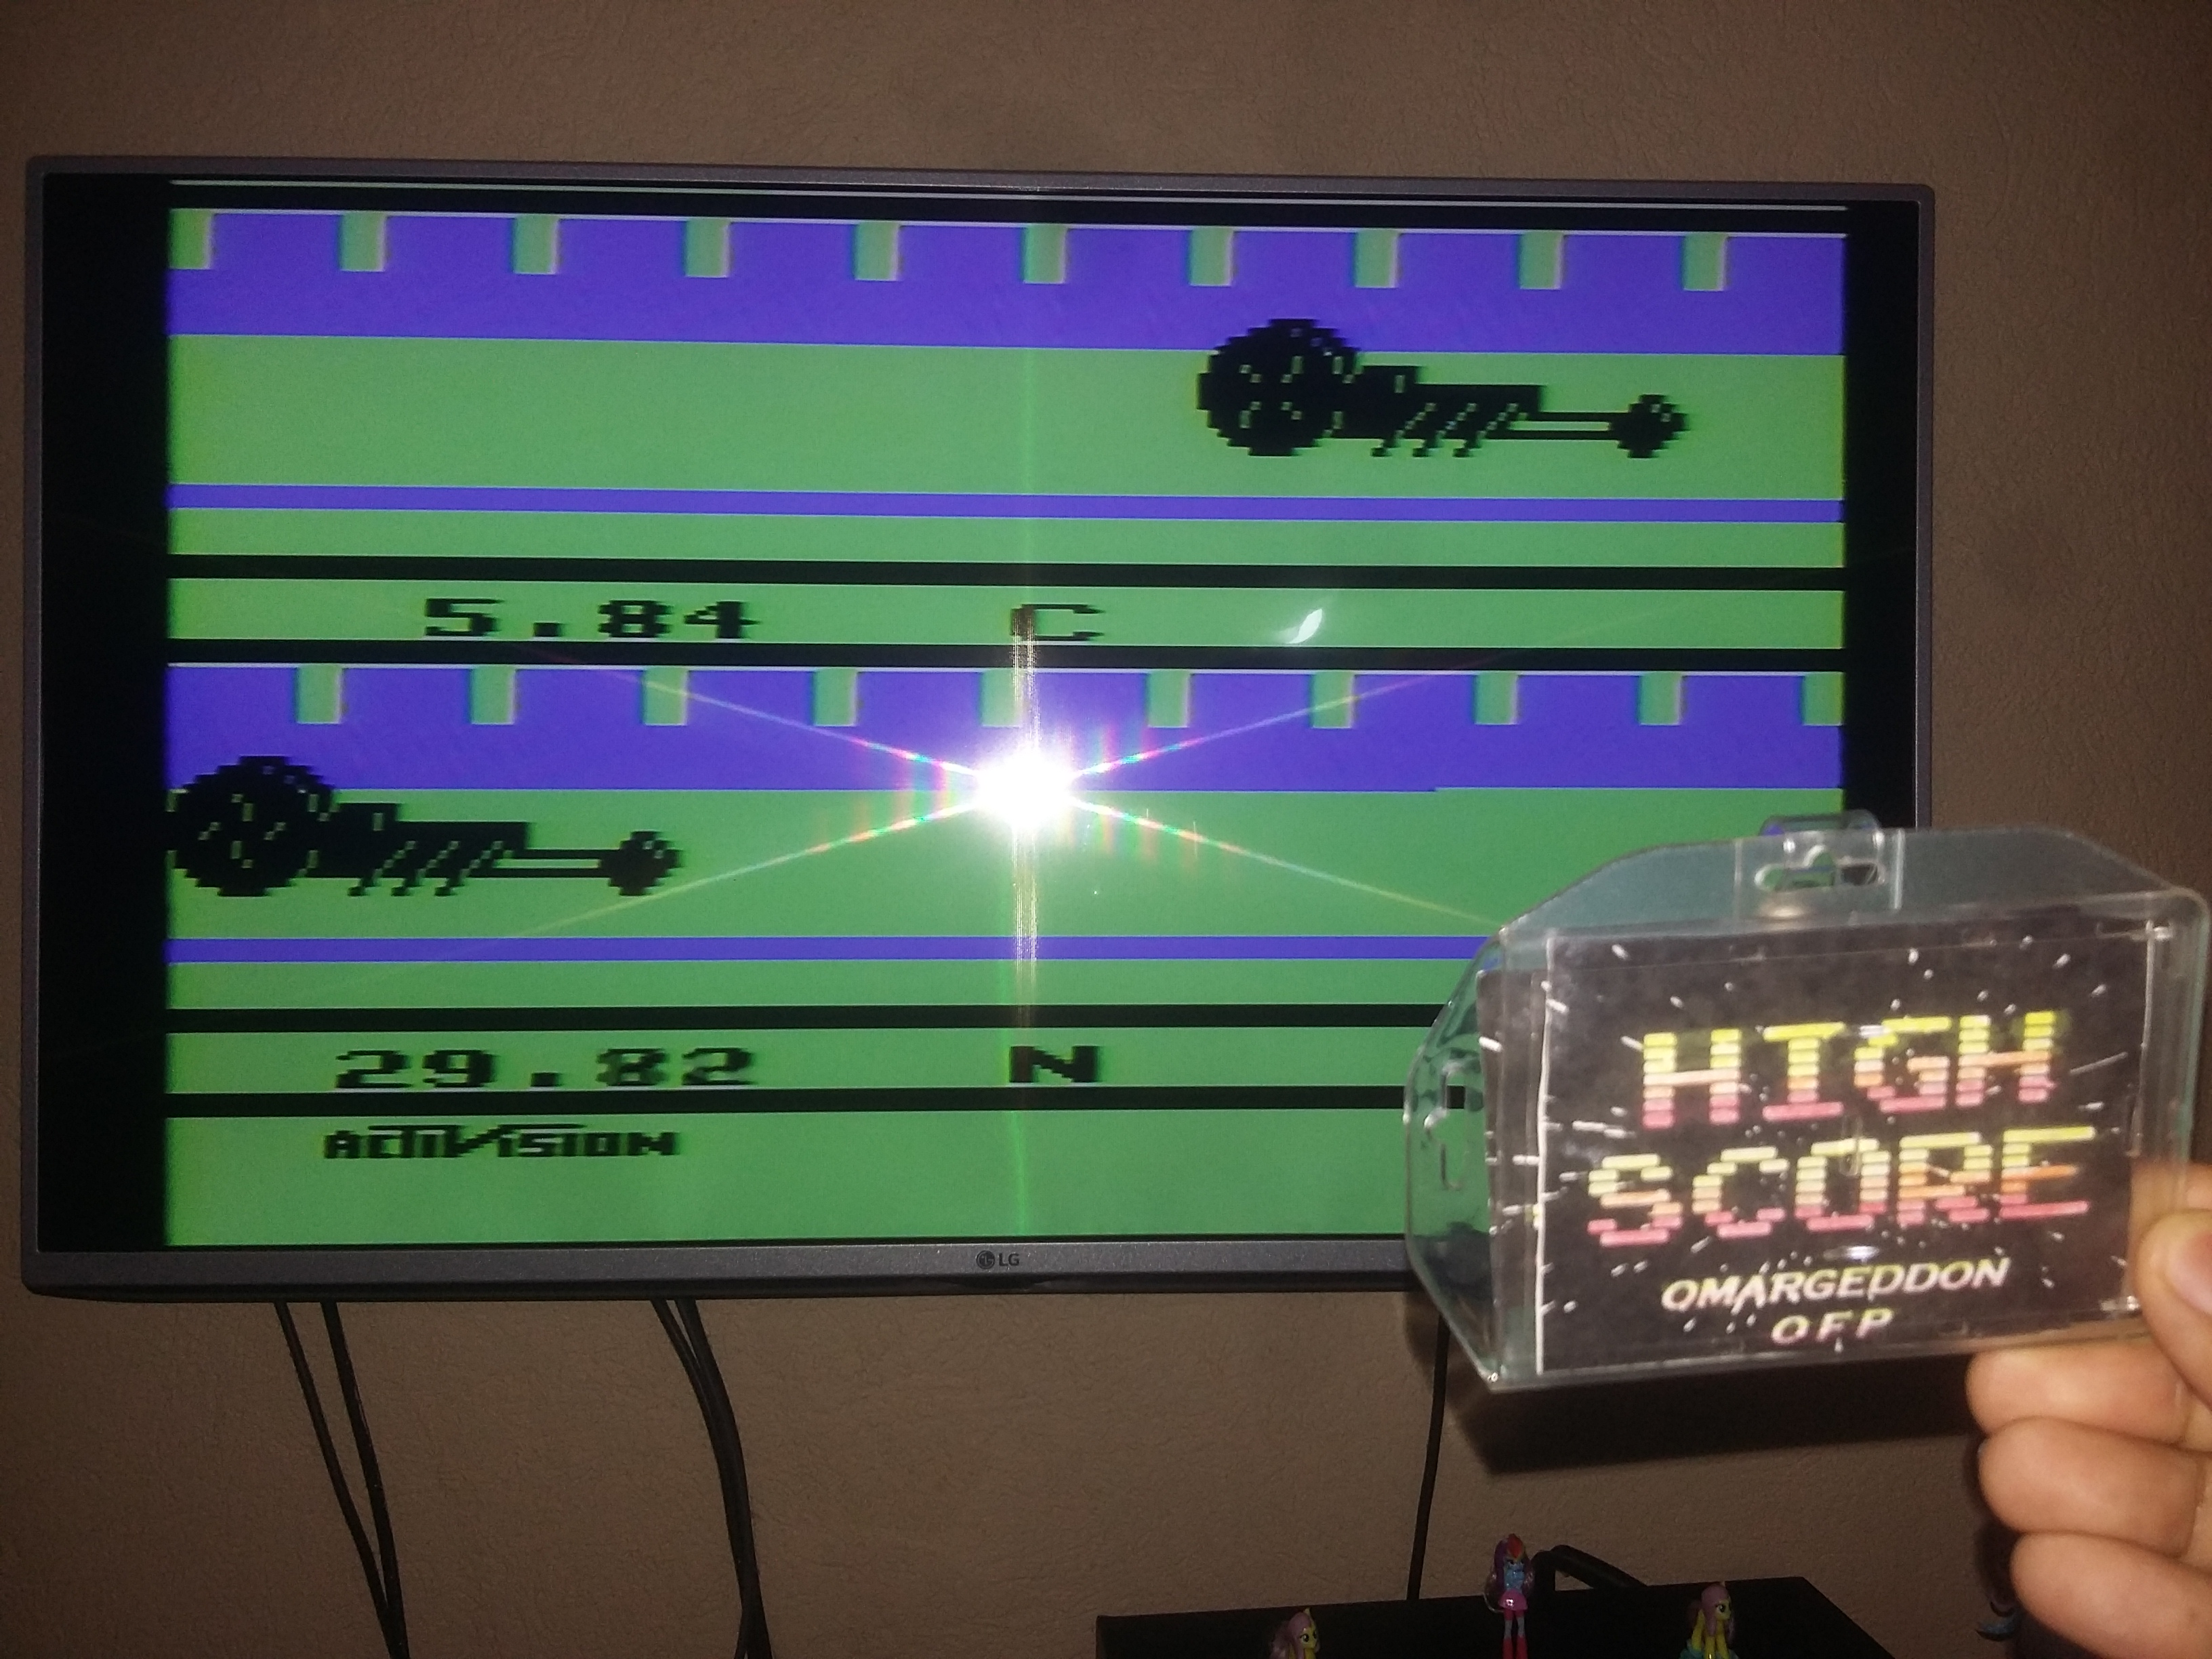 omargeddon: Dragster (Atari 2600 Novice/B) 0:00:05.84 points on 2018-03-02 19:53:19